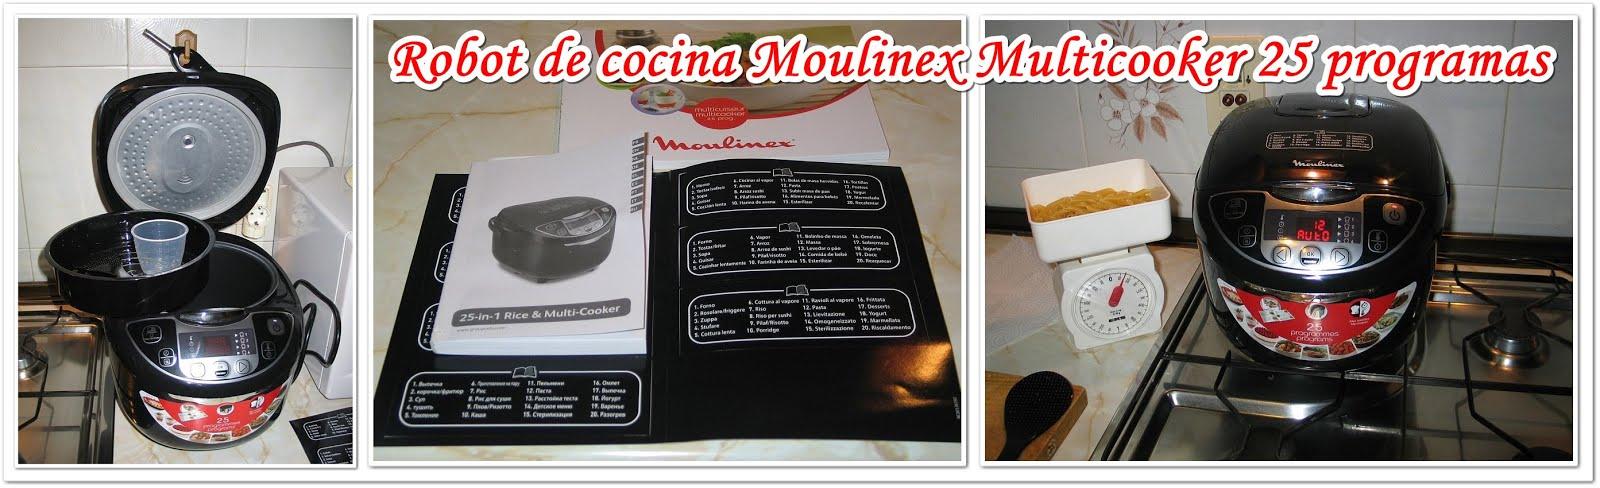 Robot De Cocina Moulinex Multicooker 25 Programas Hello World Mi